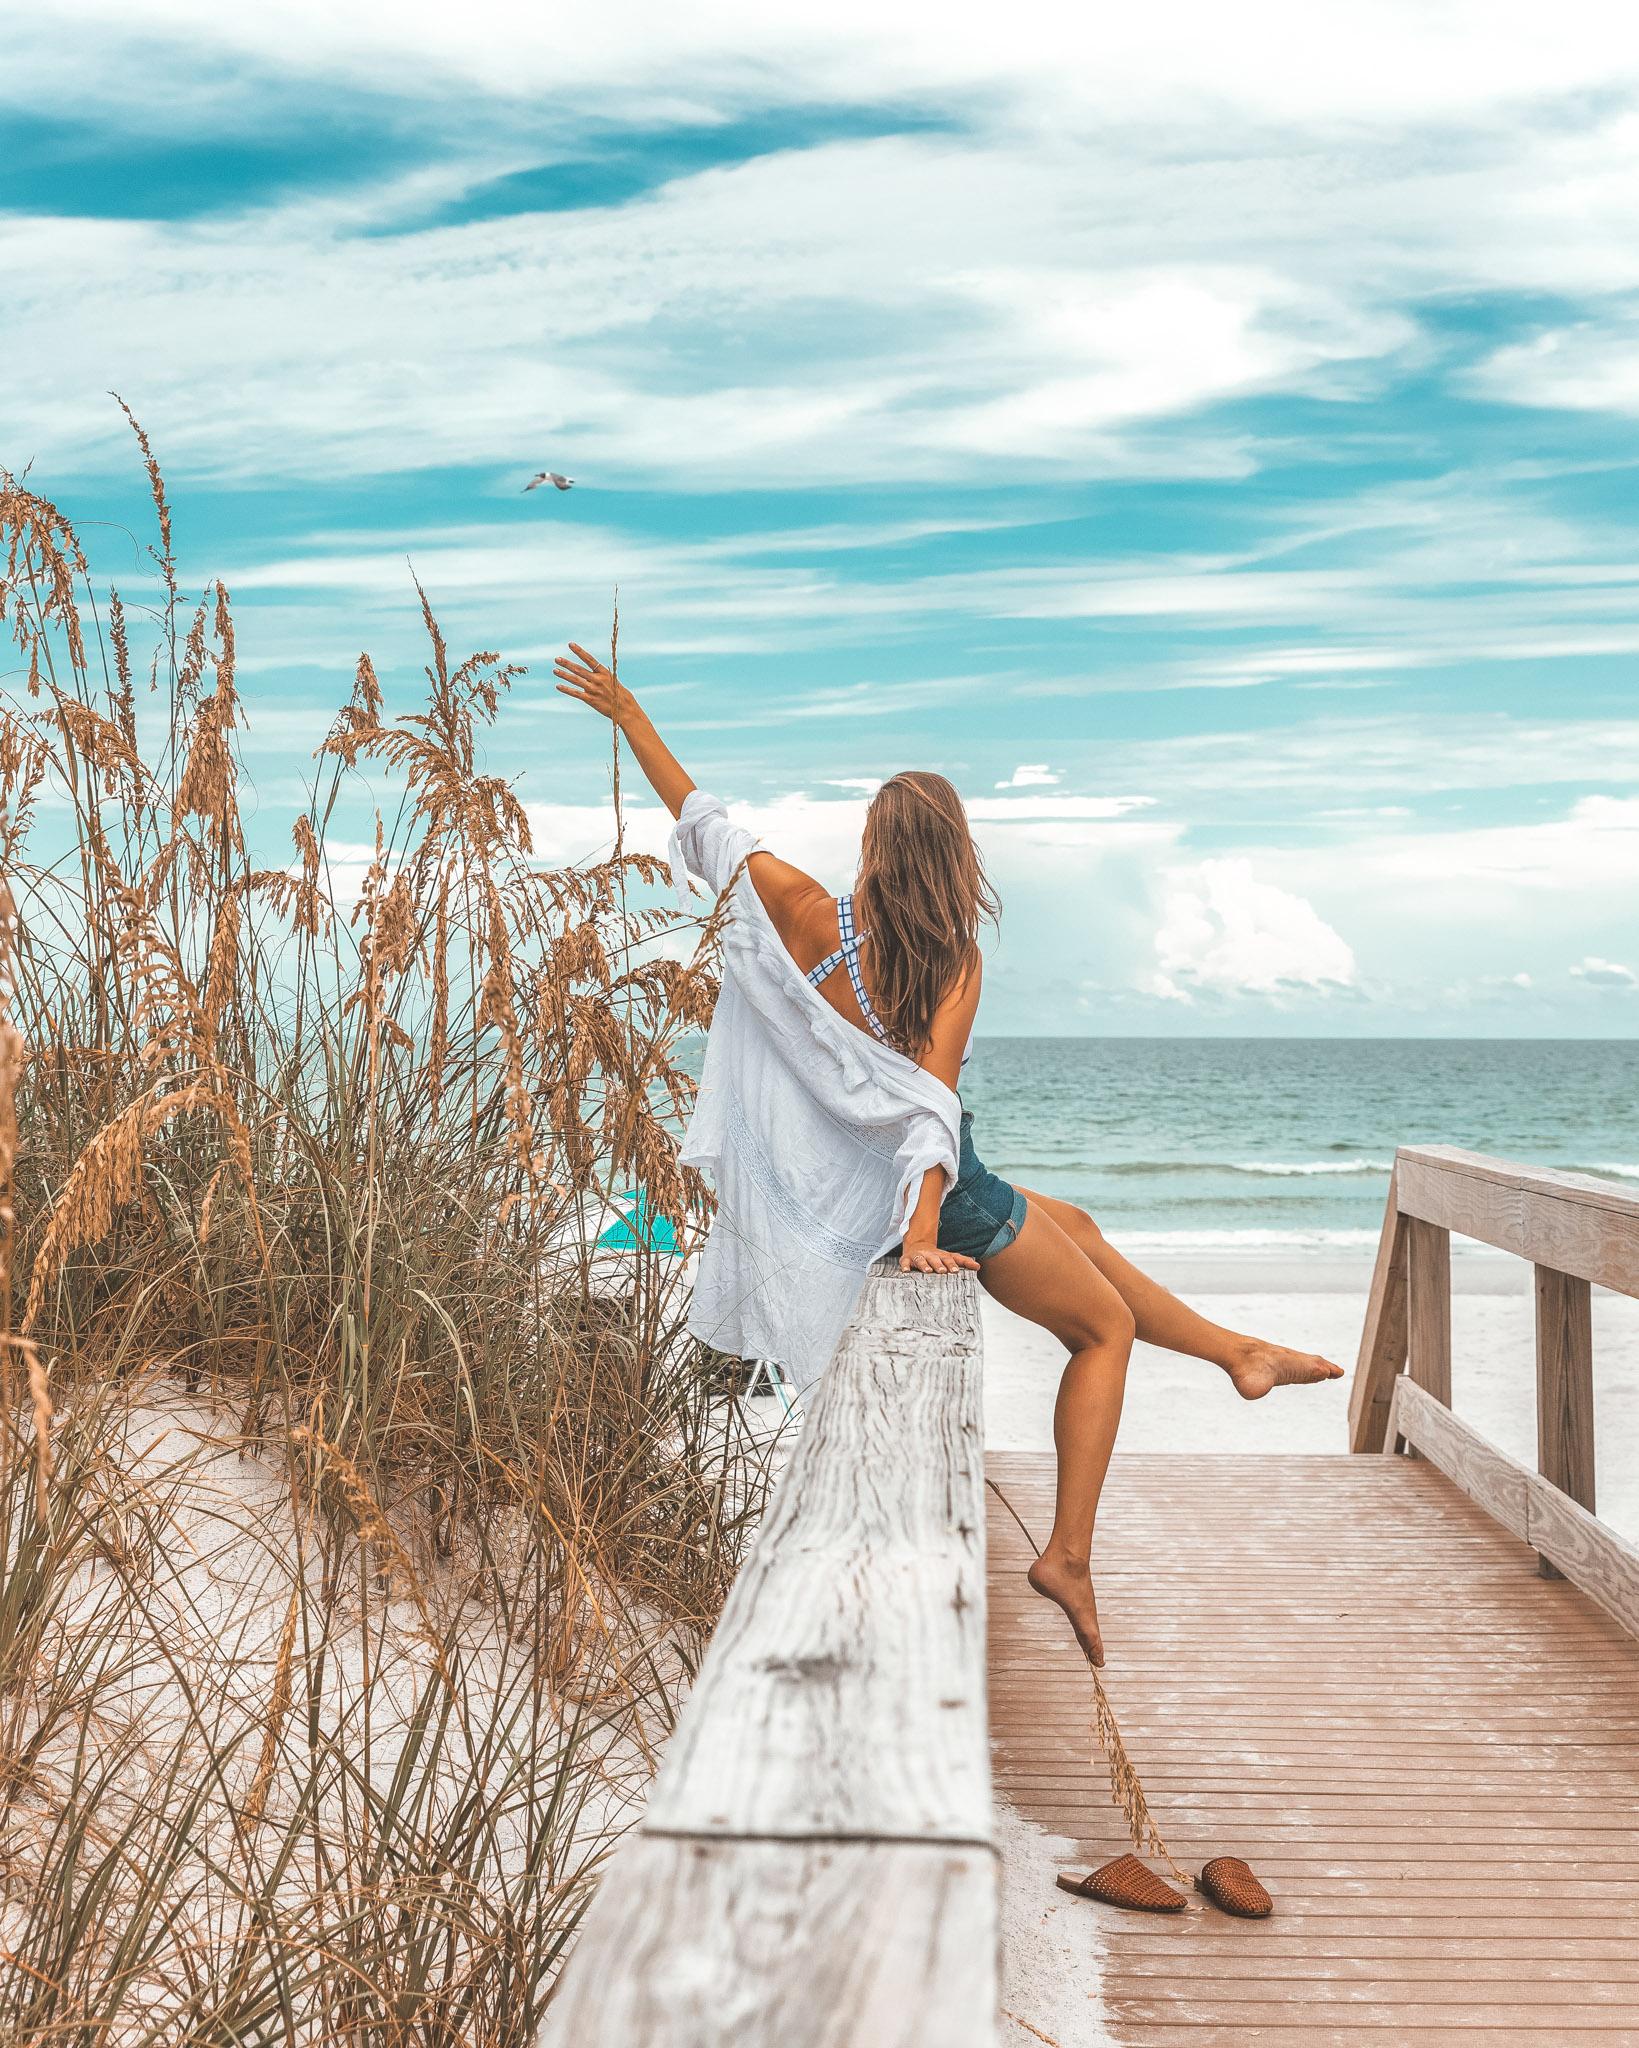 Jacksonville beaches at One Ocean Resort ~ Top Things to Do in Jacksonville, Florida ~ #readysetjetset #florida #jax #jacksonville #blogpost #travel